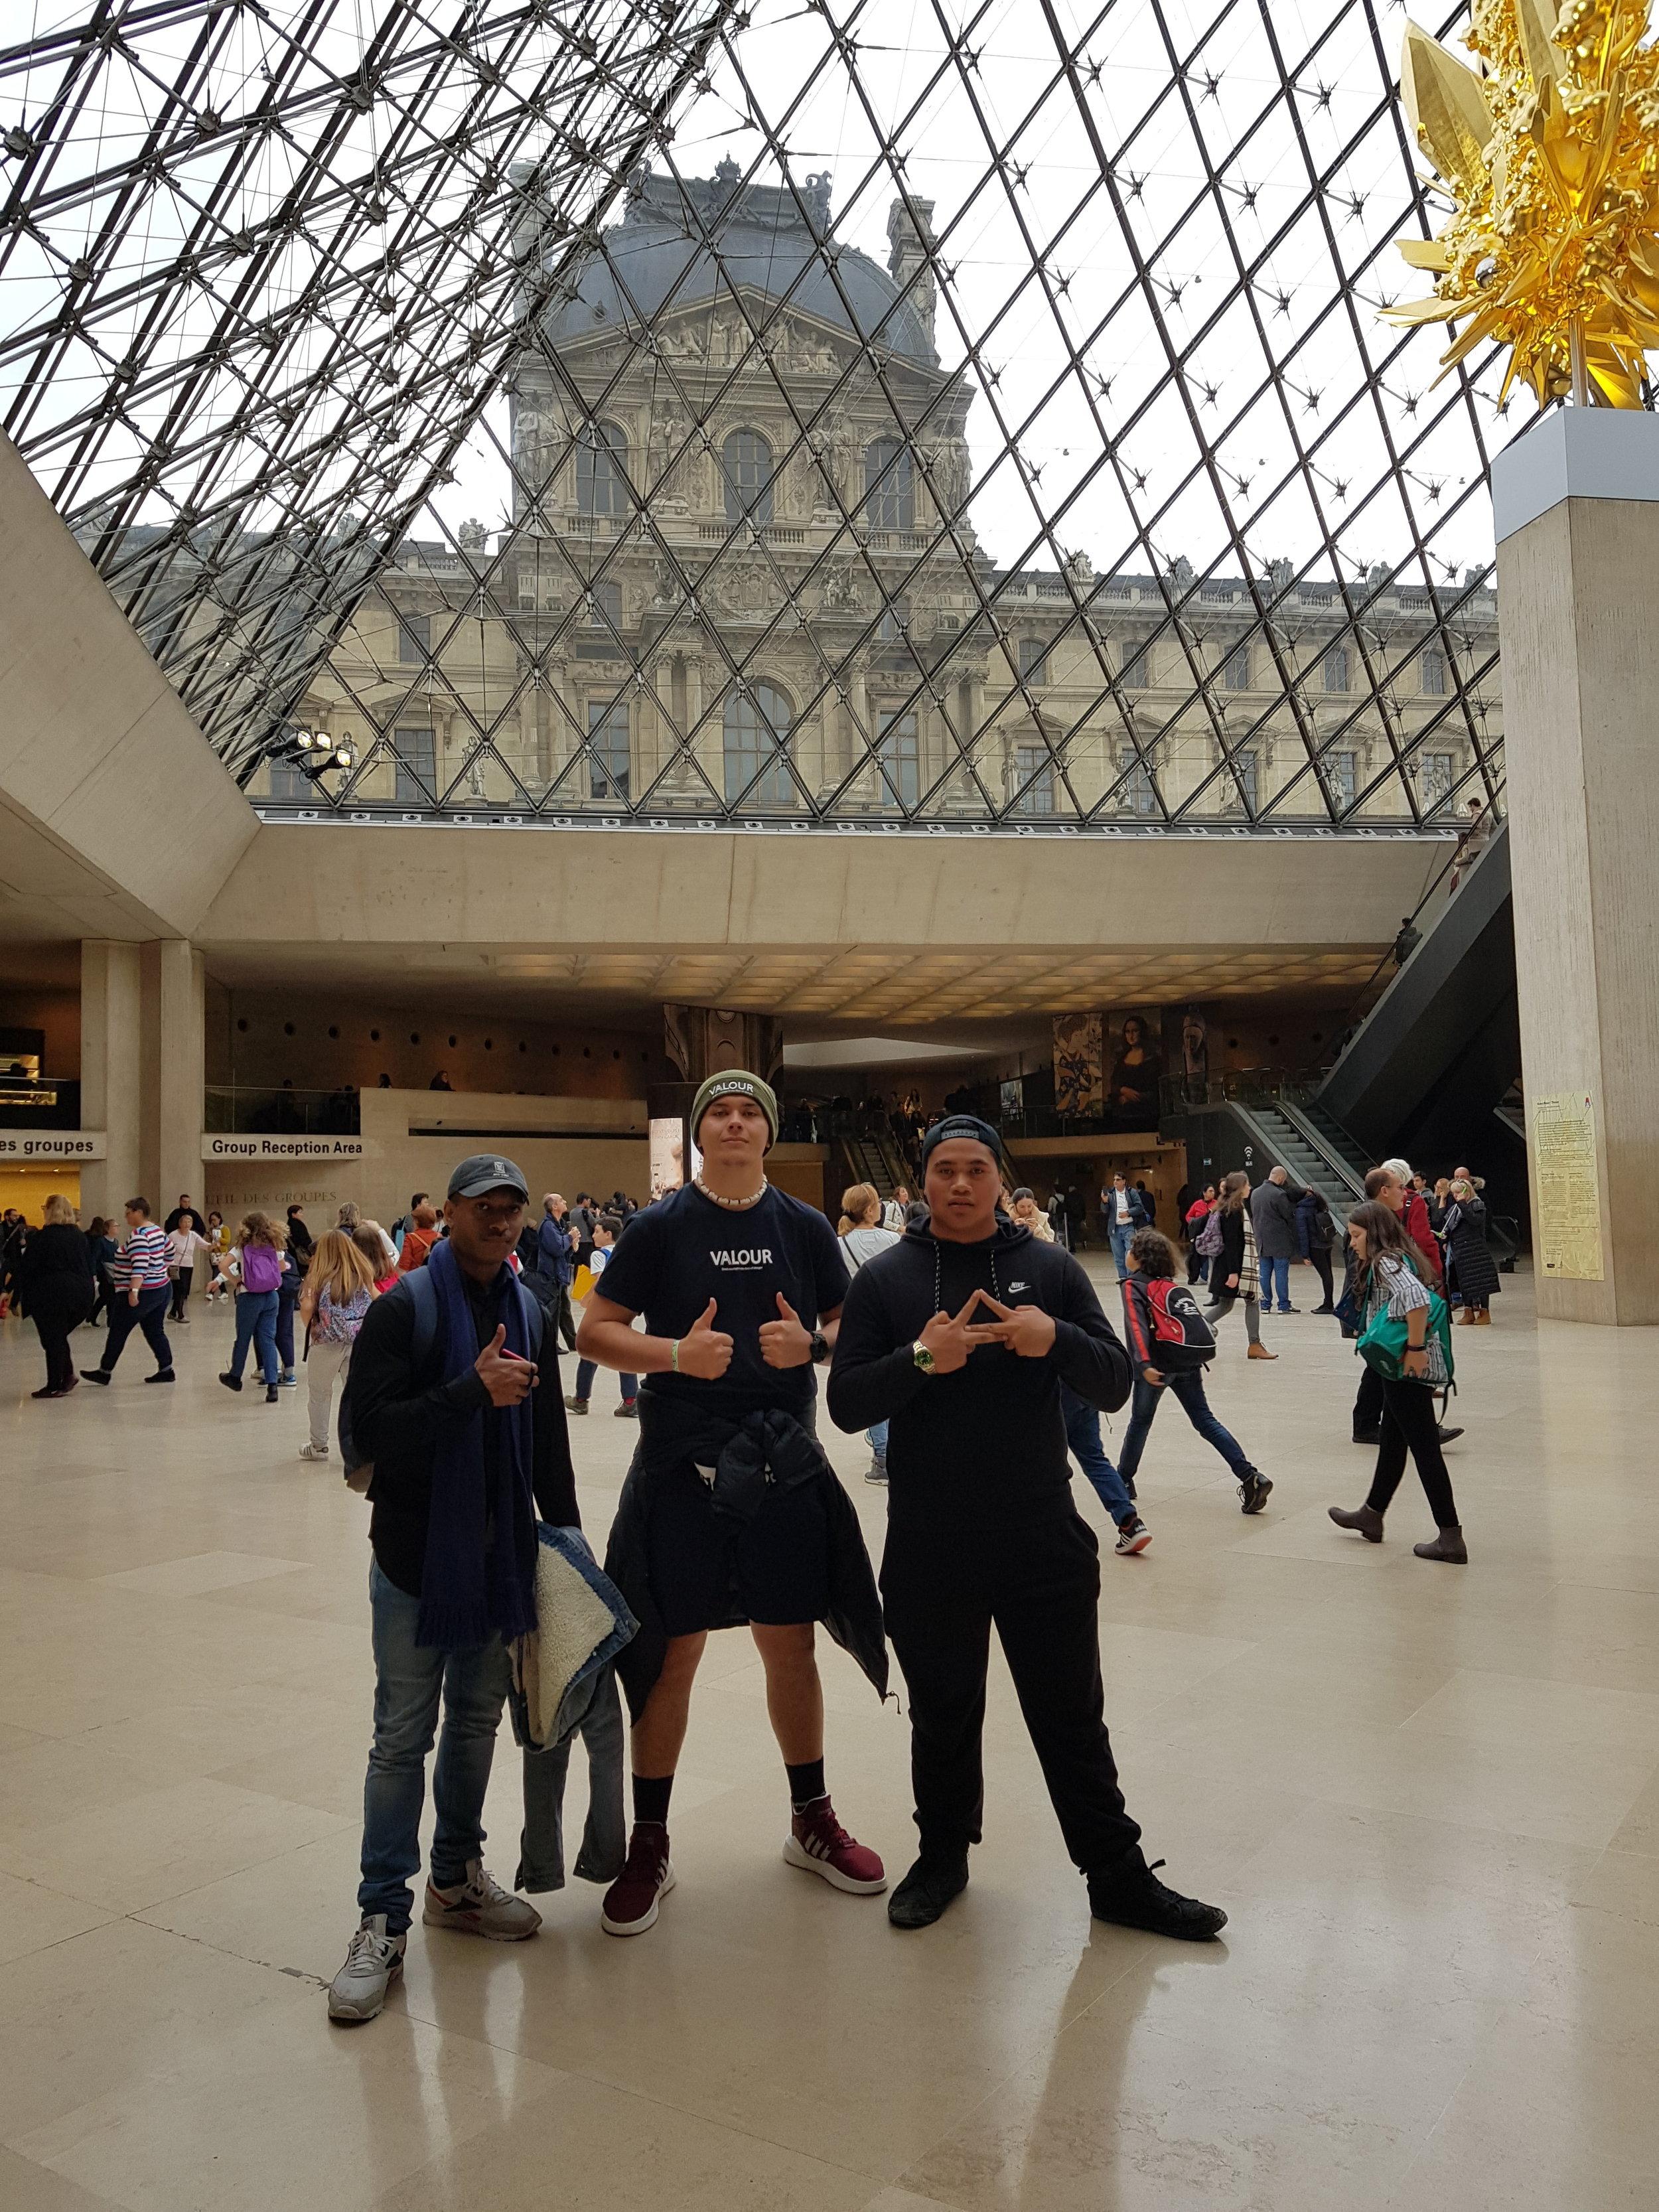 DMOV18 - Paris, Louvre Museum.